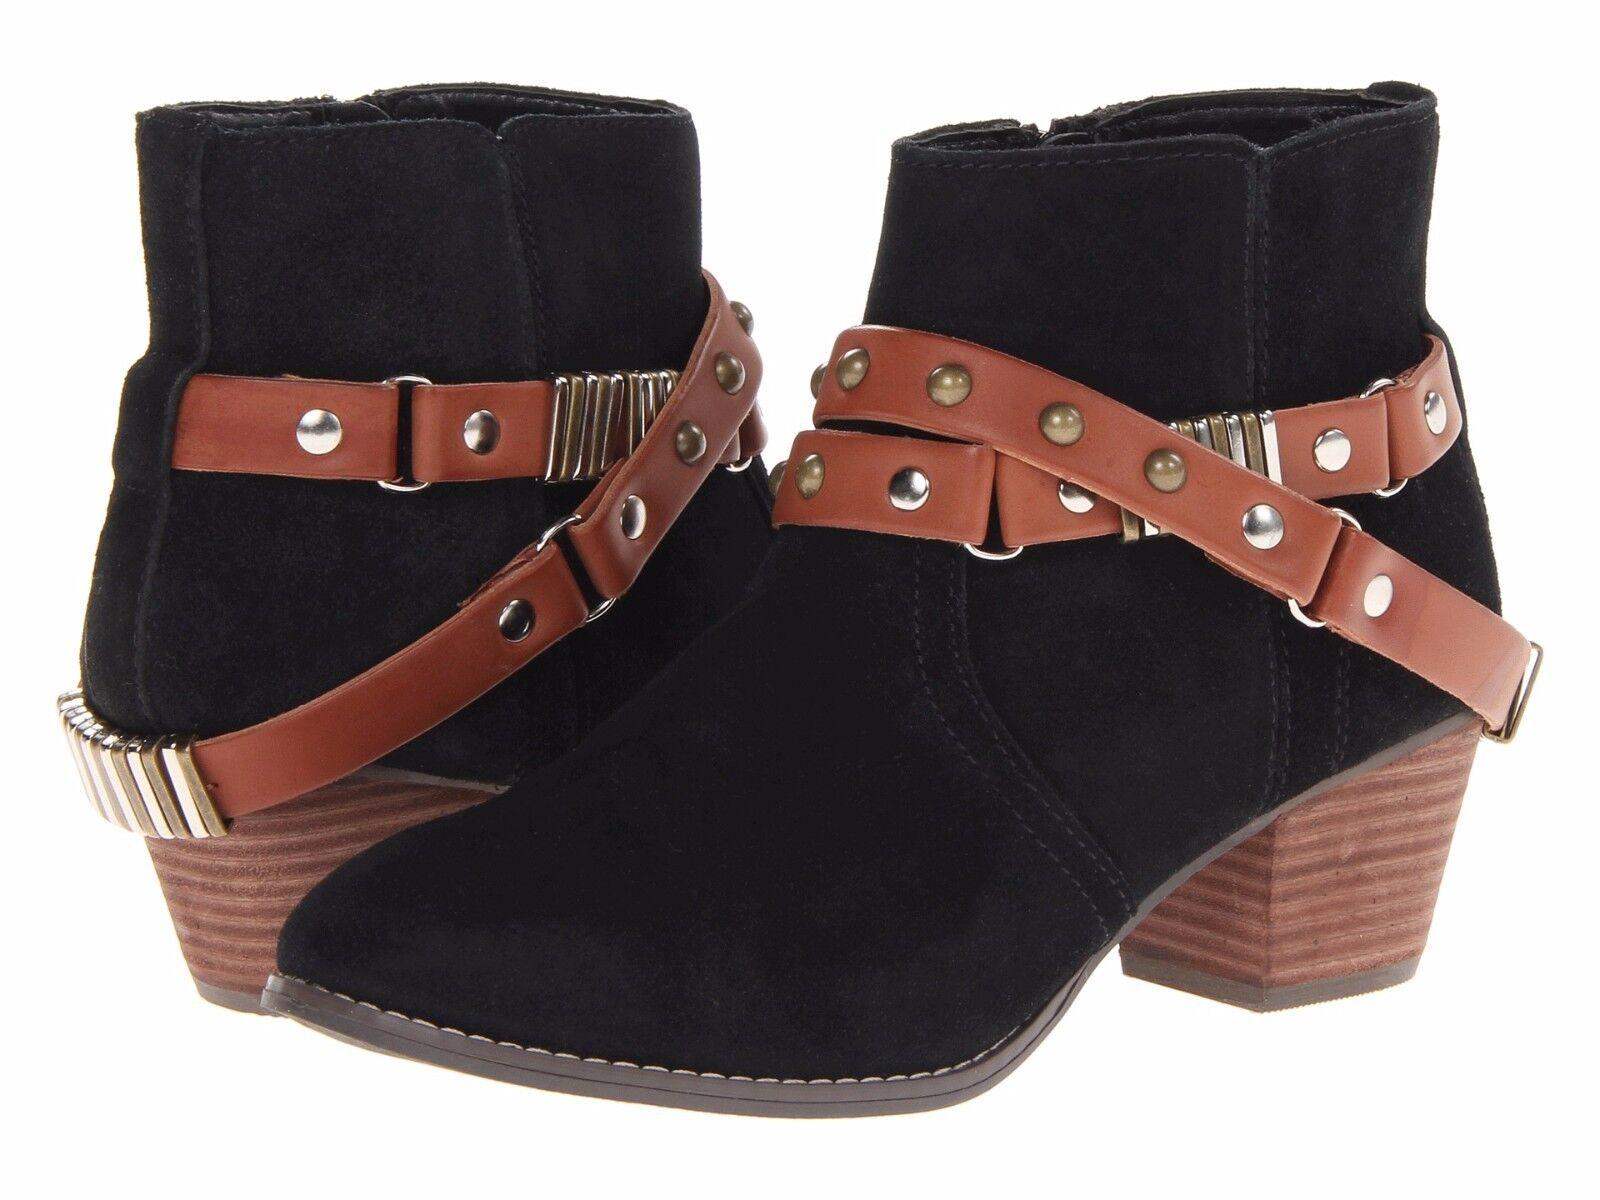 New DV by Dolce Vita Jacy ankle taupe Damens's boots Größe 7